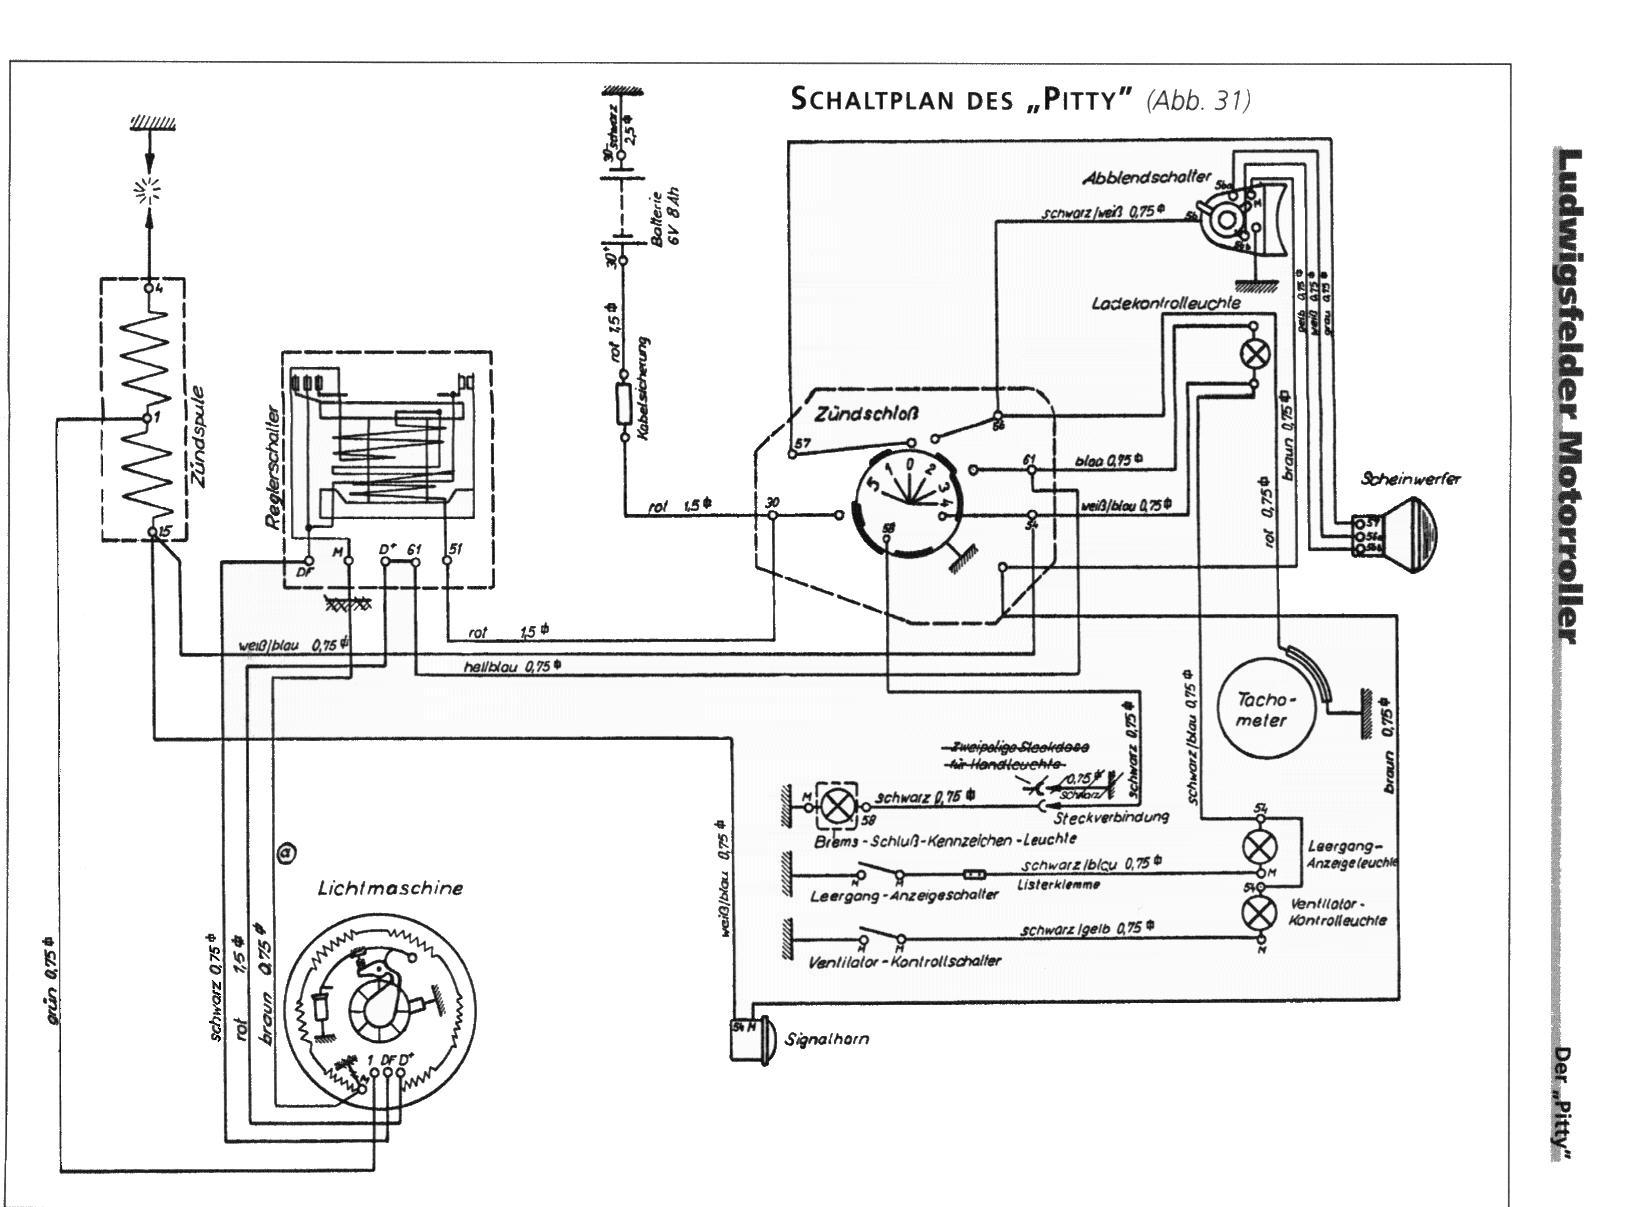 Fein Ventilator Schaltplan Galerie - Schaltplan Serie Circuit ...